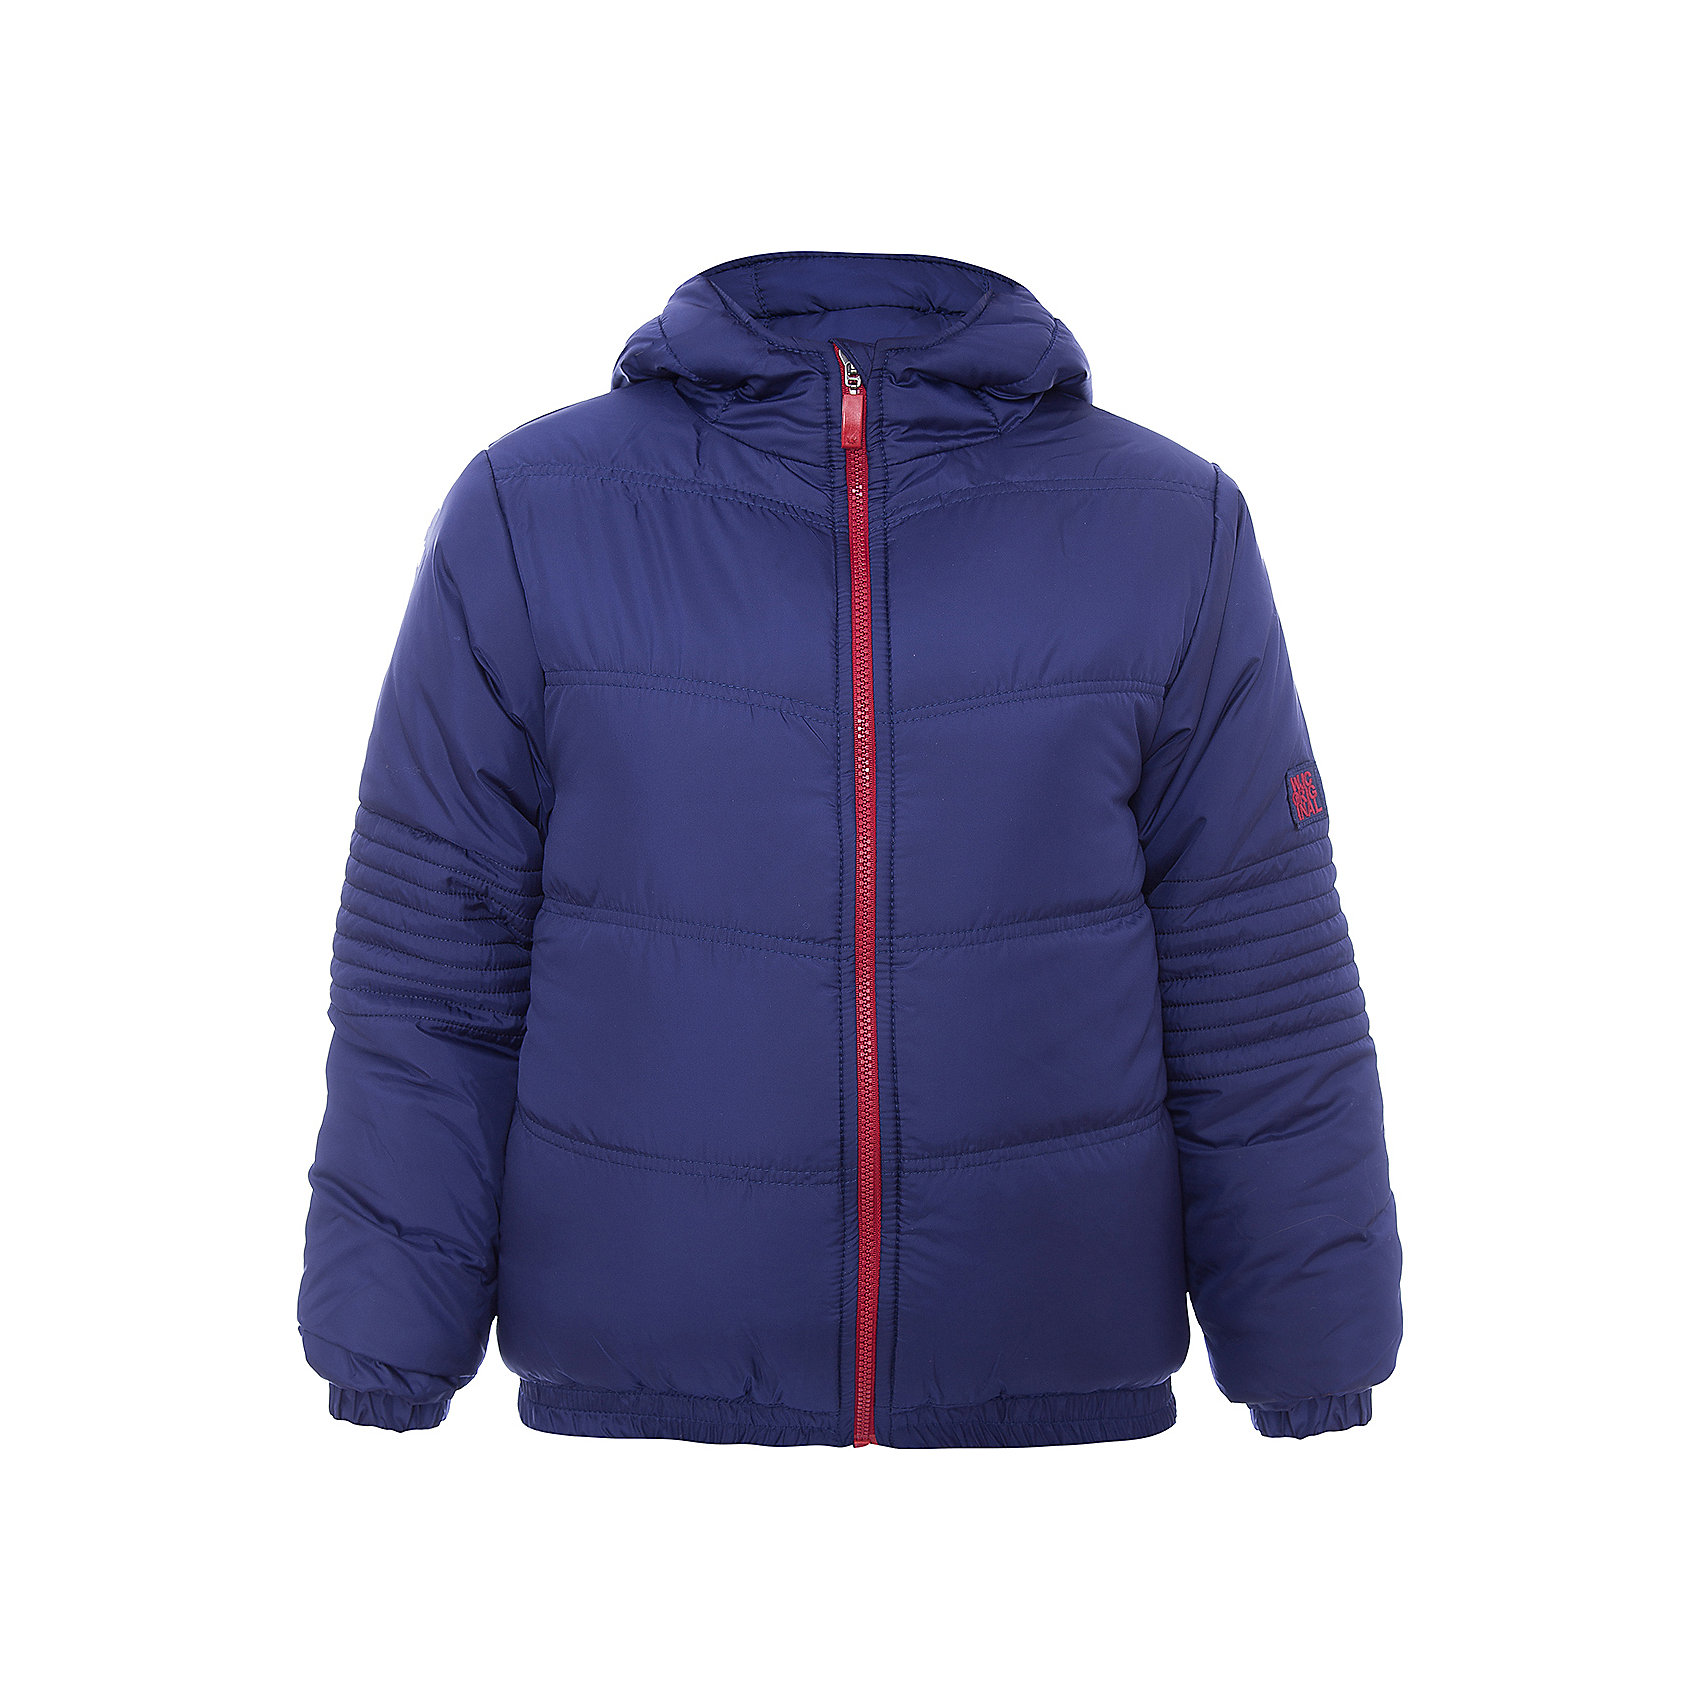 Куртка утепленная для мальчика WojcikВерхняя одежда<br>Куртка утепленная для мальчика Wojcik<br>Состав:<br>Полиэстер 100%<br><br>Ширина мм: 356<br>Глубина мм: 10<br>Высота мм: 245<br>Вес г: 519<br>Цвет: темно-синий<br>Возраст от месяцев: 144<br>Возраст до месяцев: 156<br>Пол: Мужской<br>Возраст: Детский<br>Размер: 158,128,134,140,146,152<br>SKU: 5592280